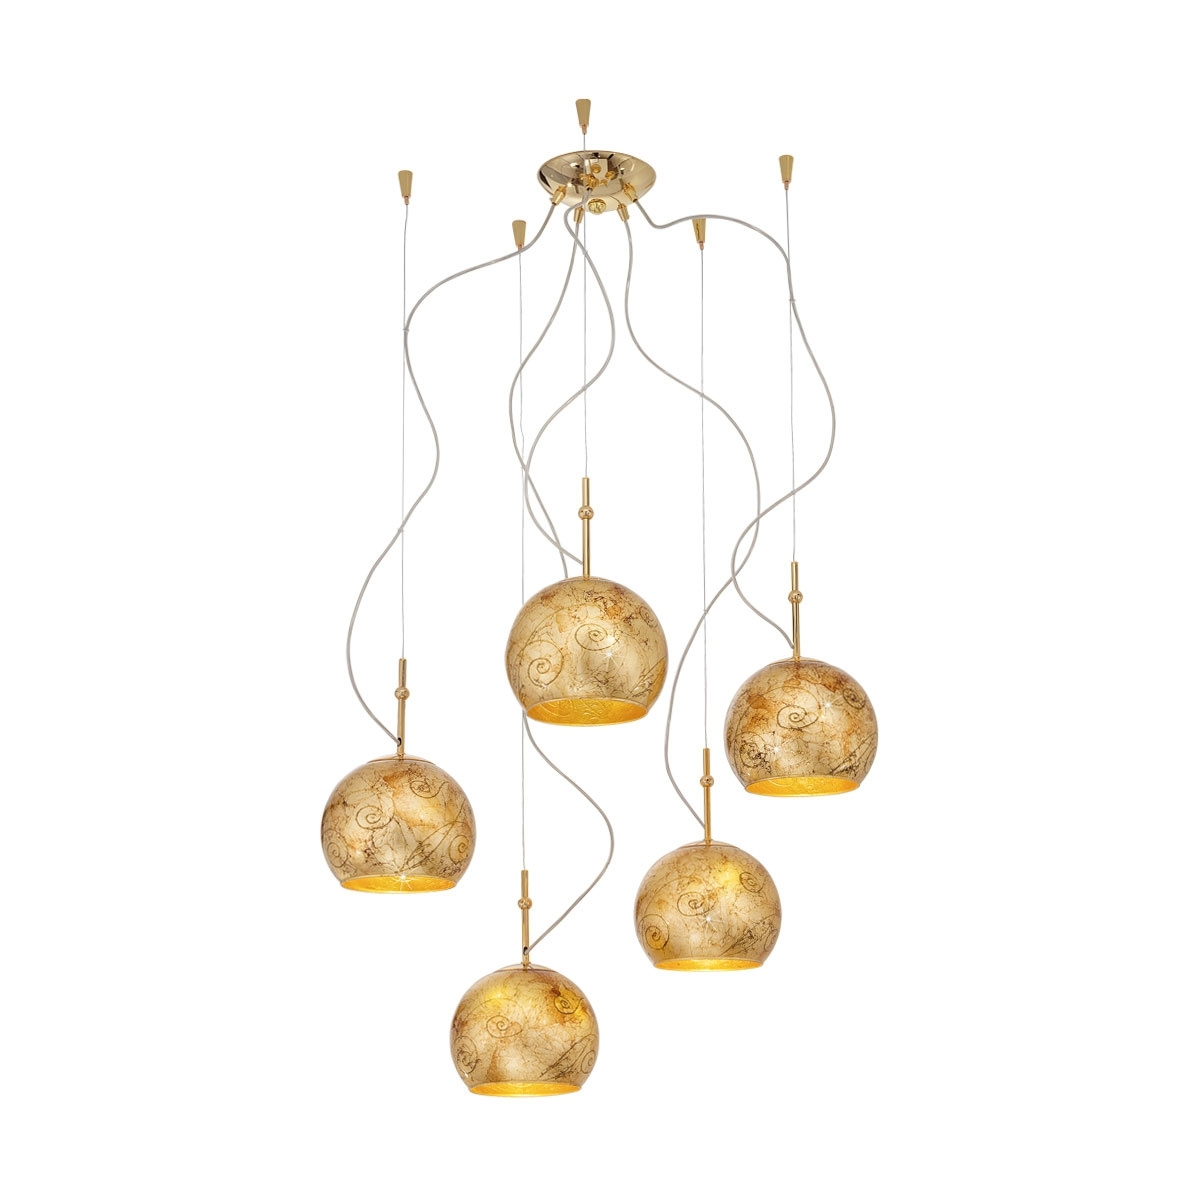 kolarz-pendelleuchte-luna-pl-gold-glas-metall-0392-35-3-me-au